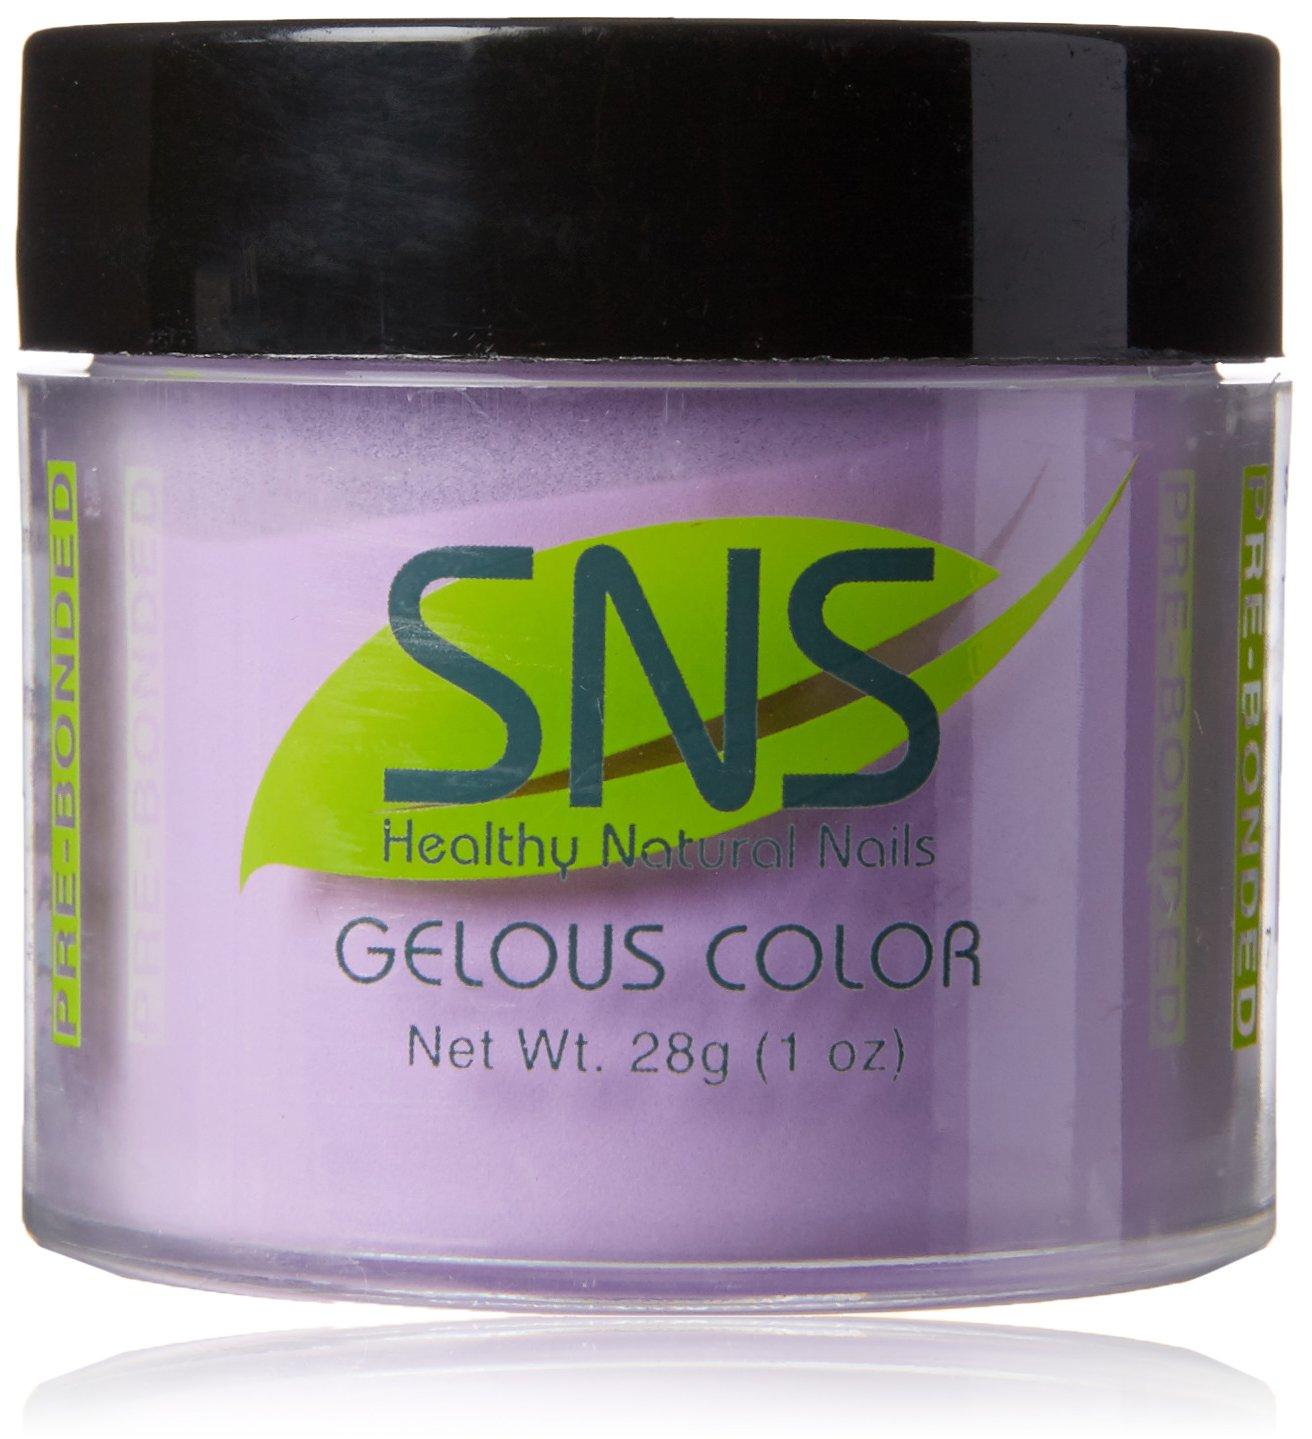 SNS 303 Nails Dipping Powder No Liquid Primer UV Light 635635722388 ...